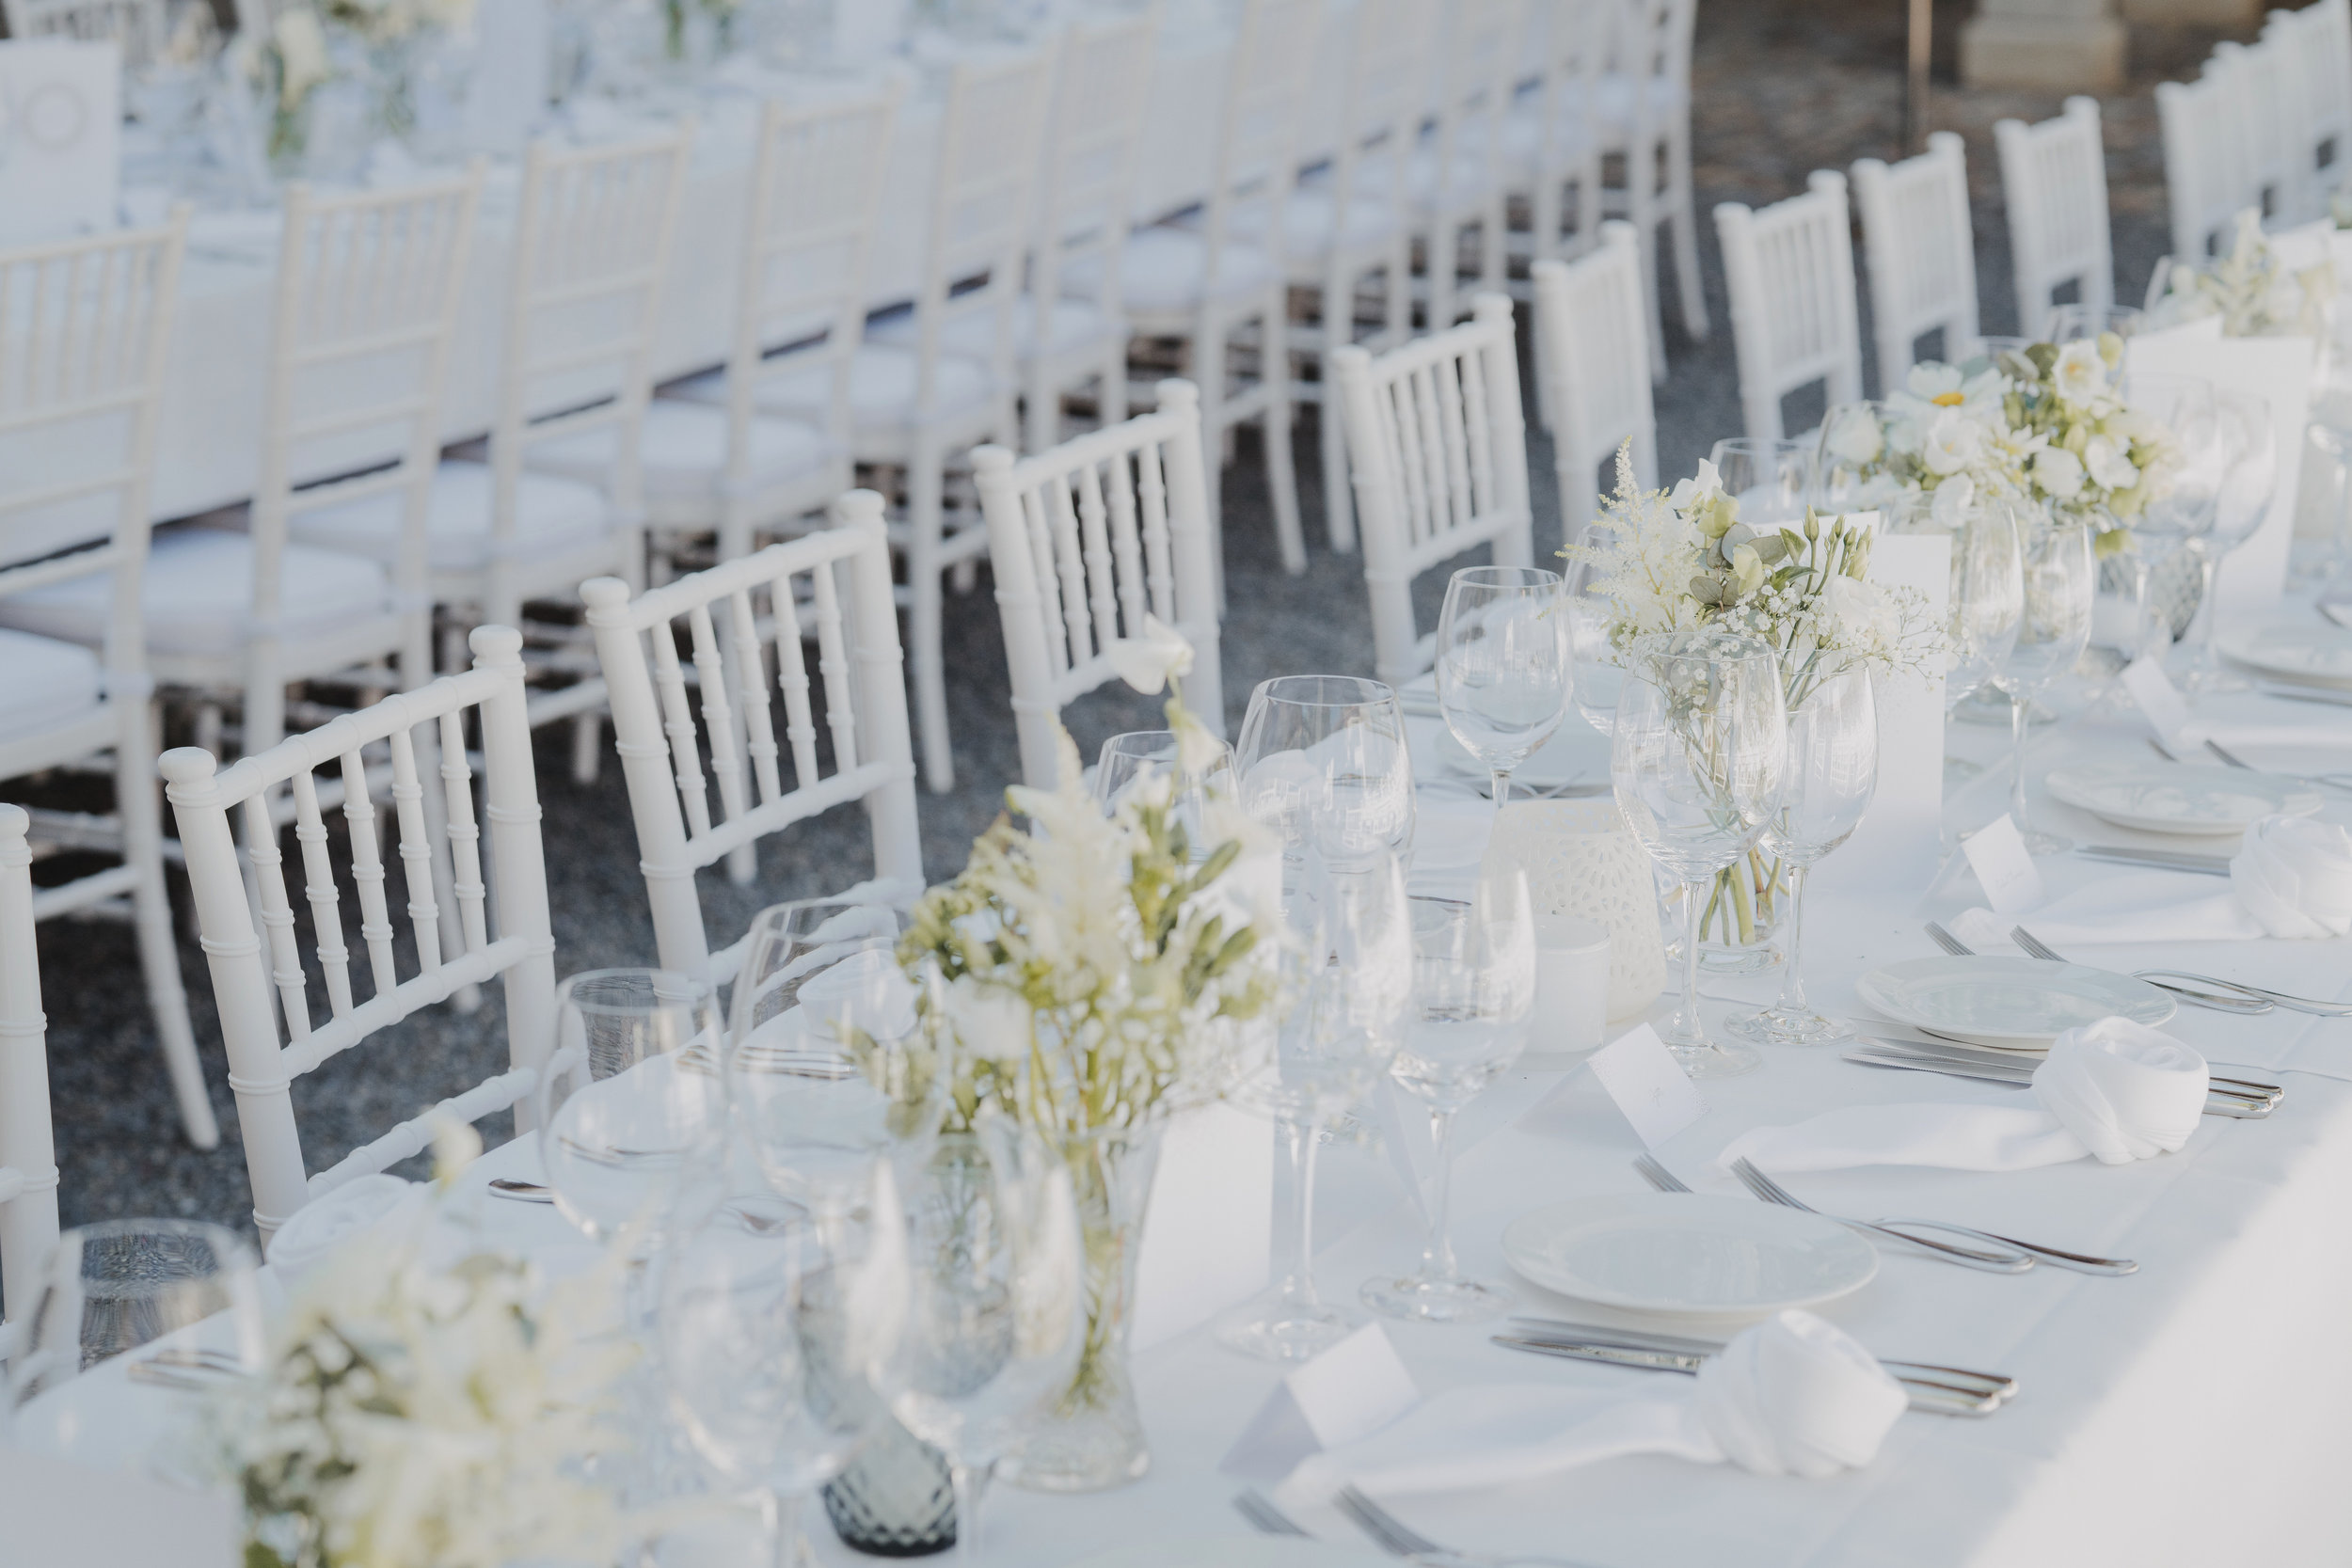 201807274504JC_wedding-0139620180824.jpg